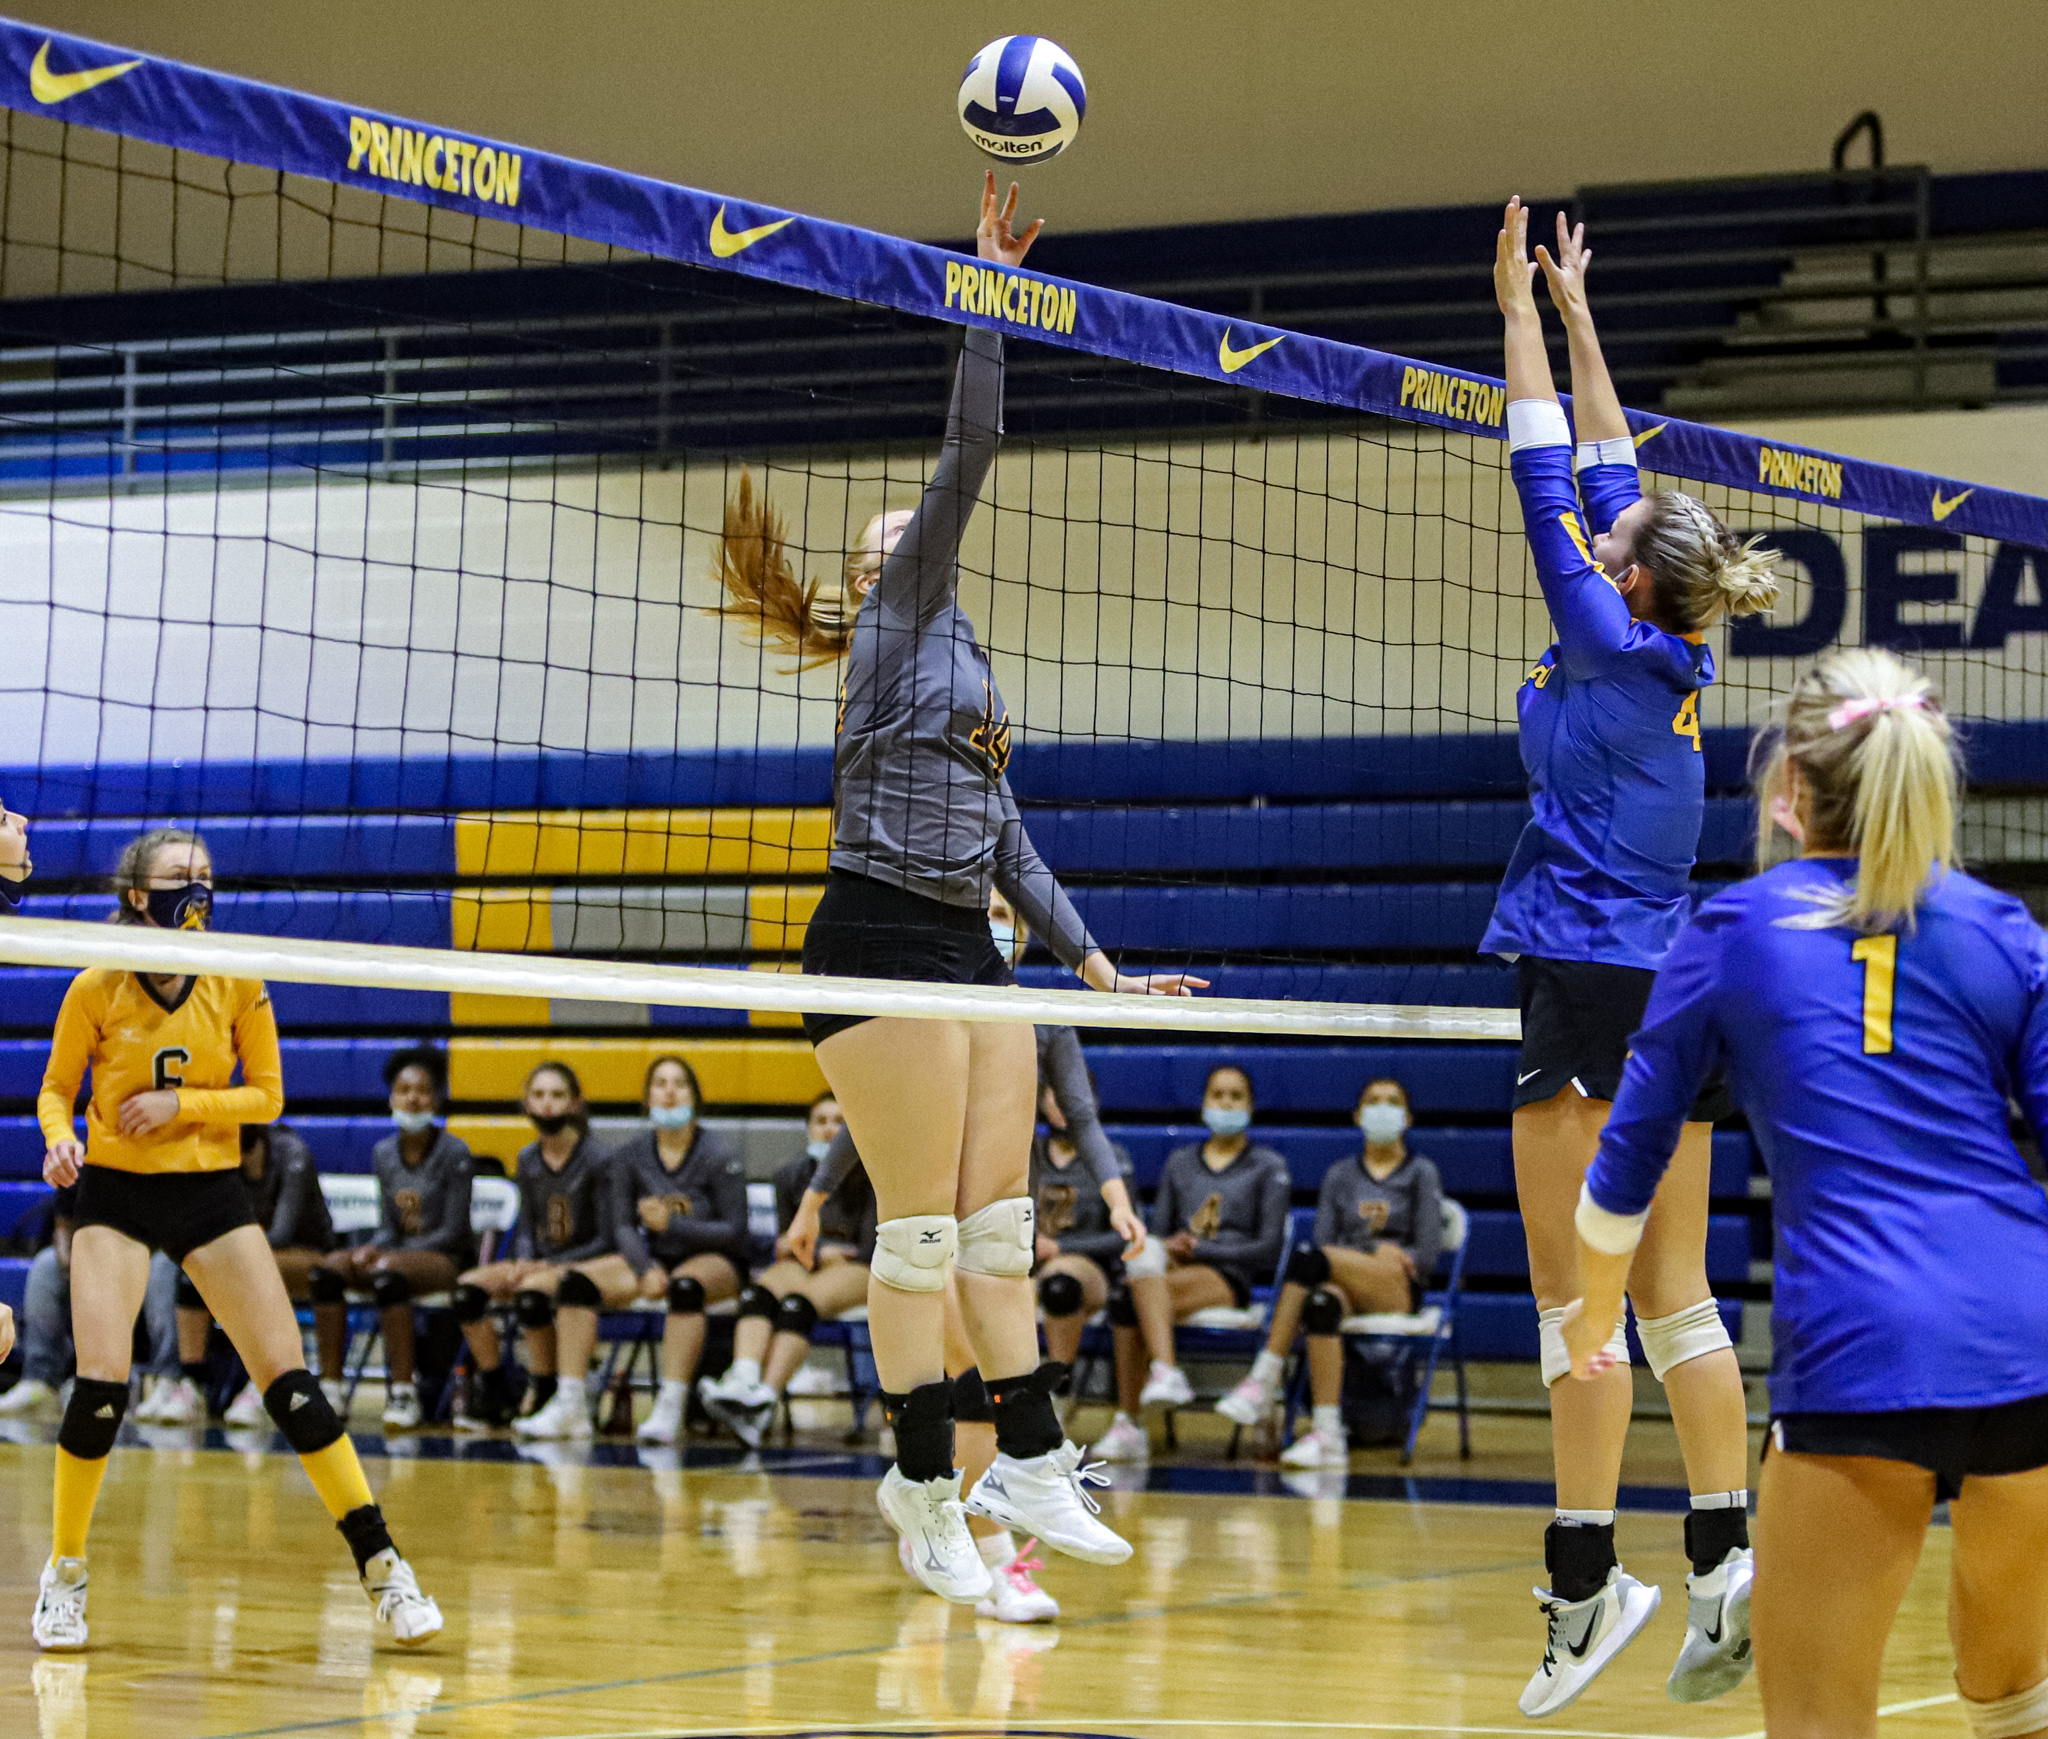 Goldsboro vs. Princeton Volleyball 10/20/21